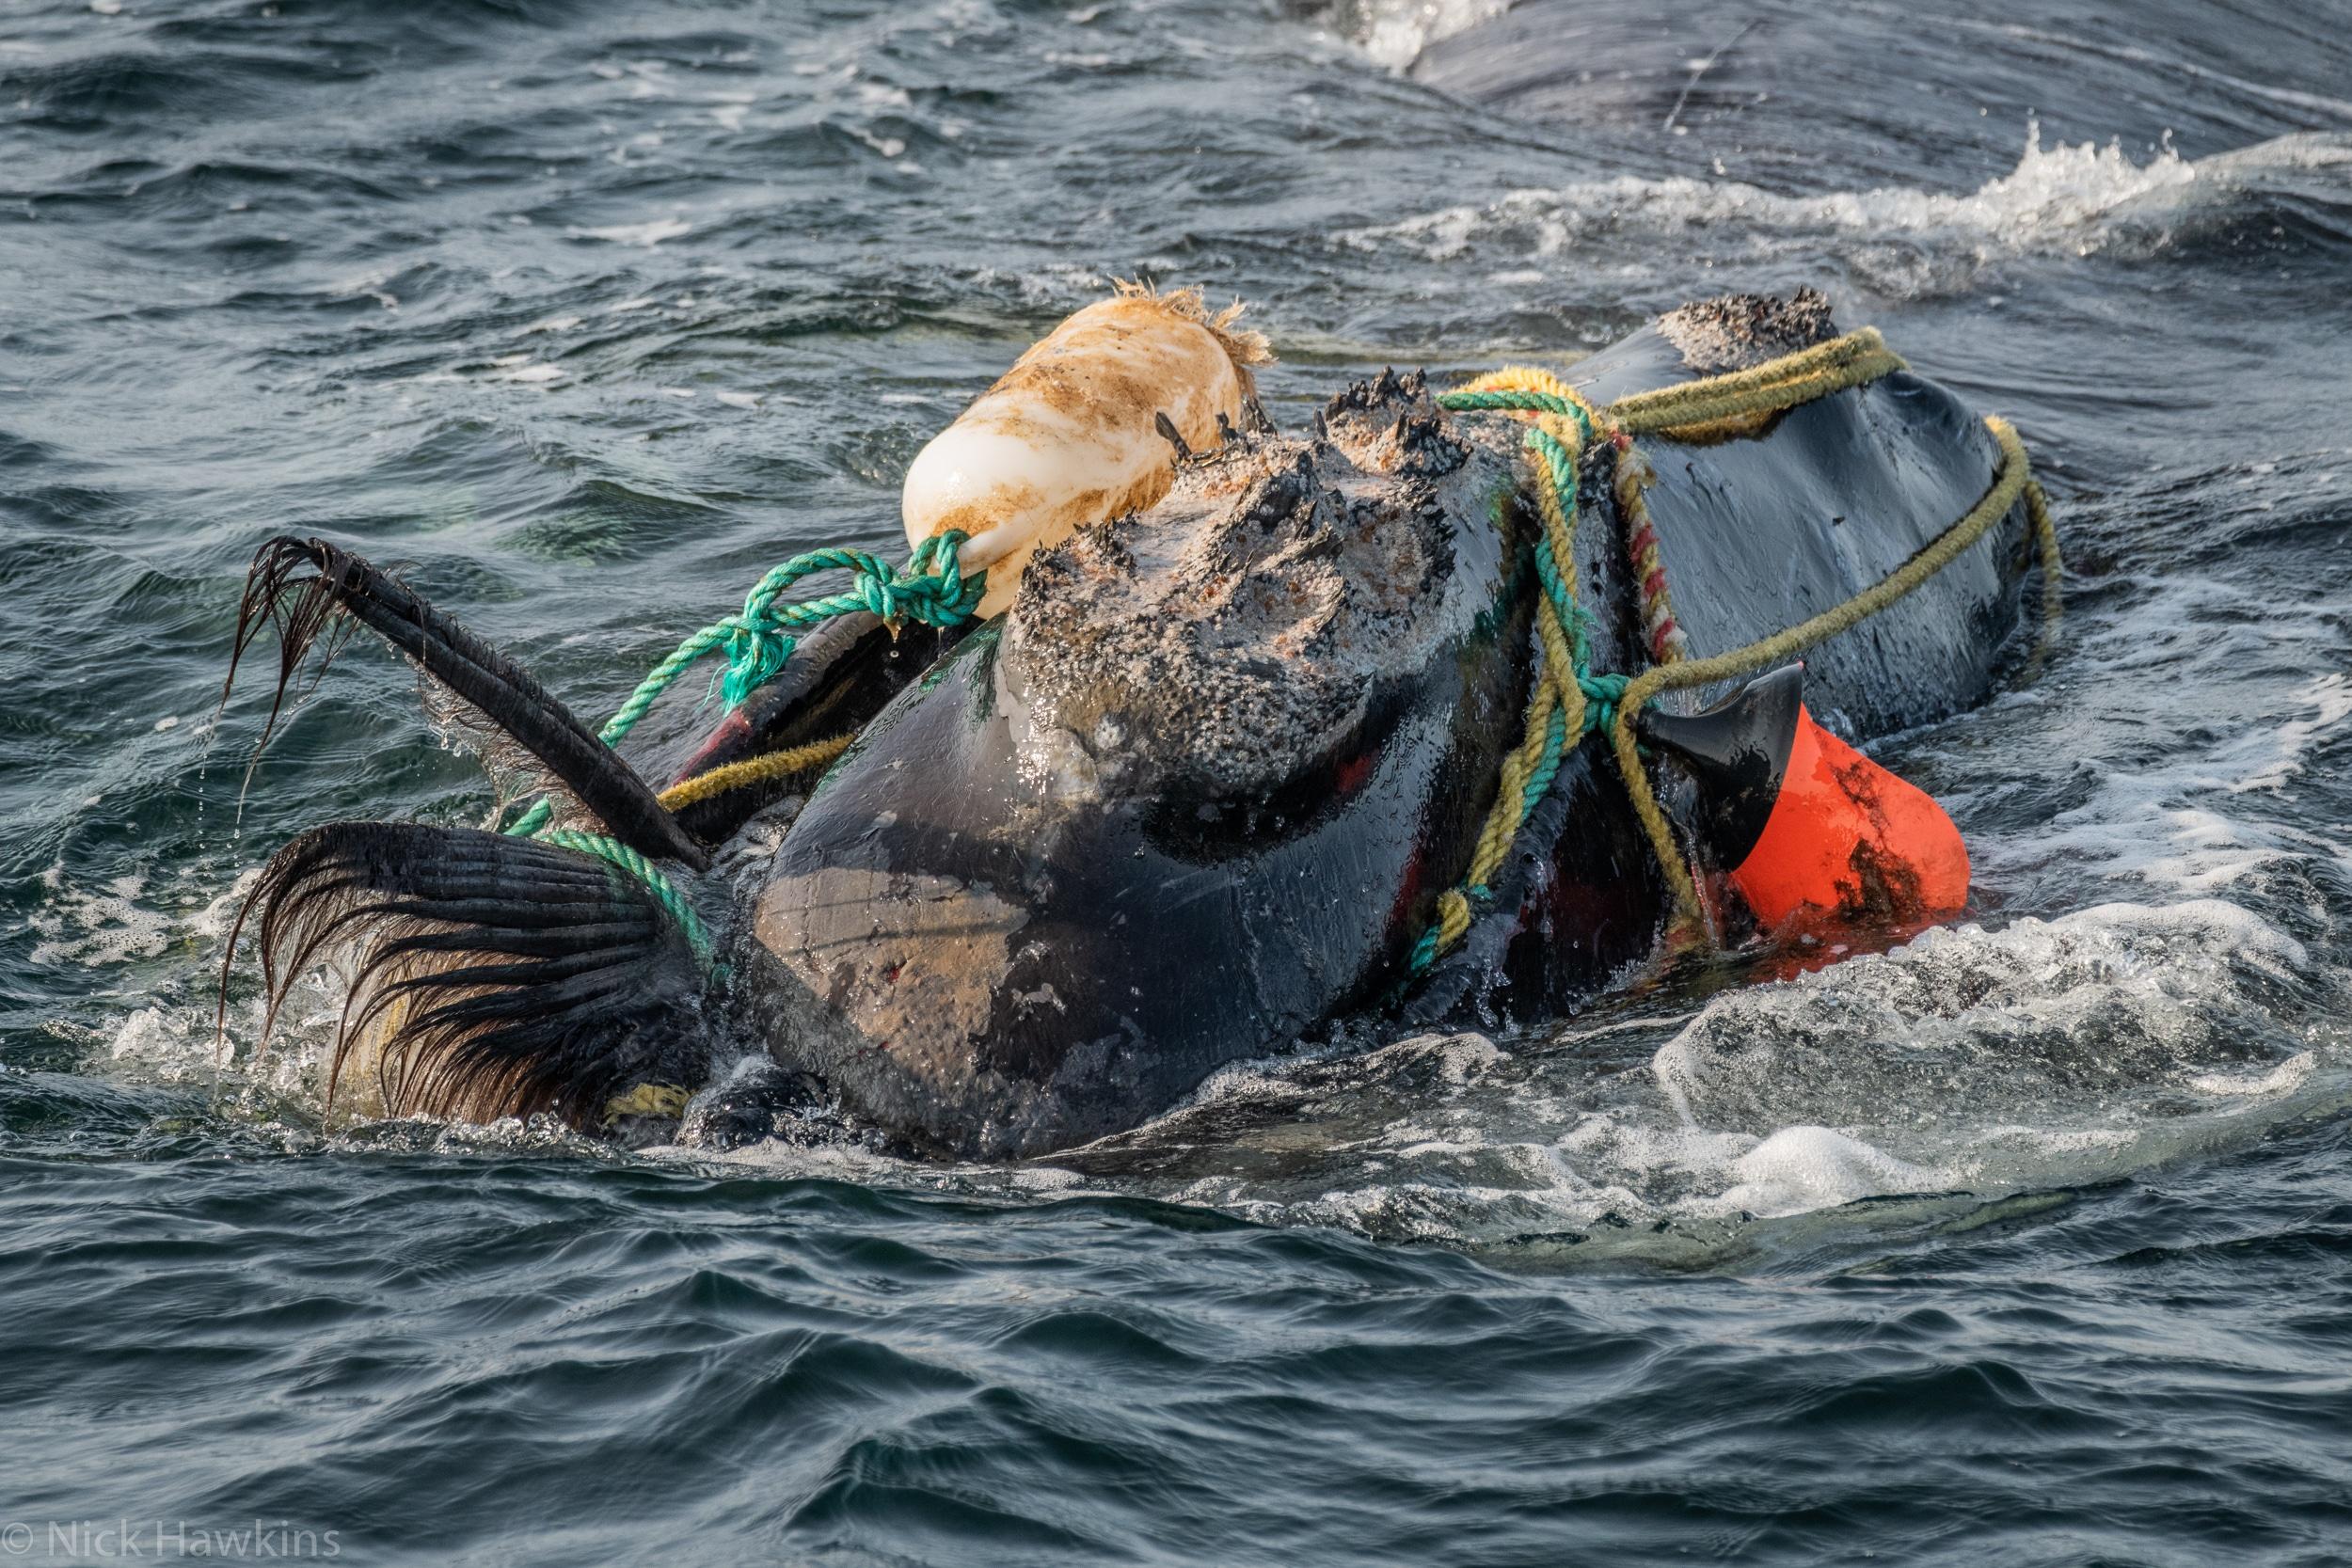 Entangled Whale (Image credit: Nick Hawkins)